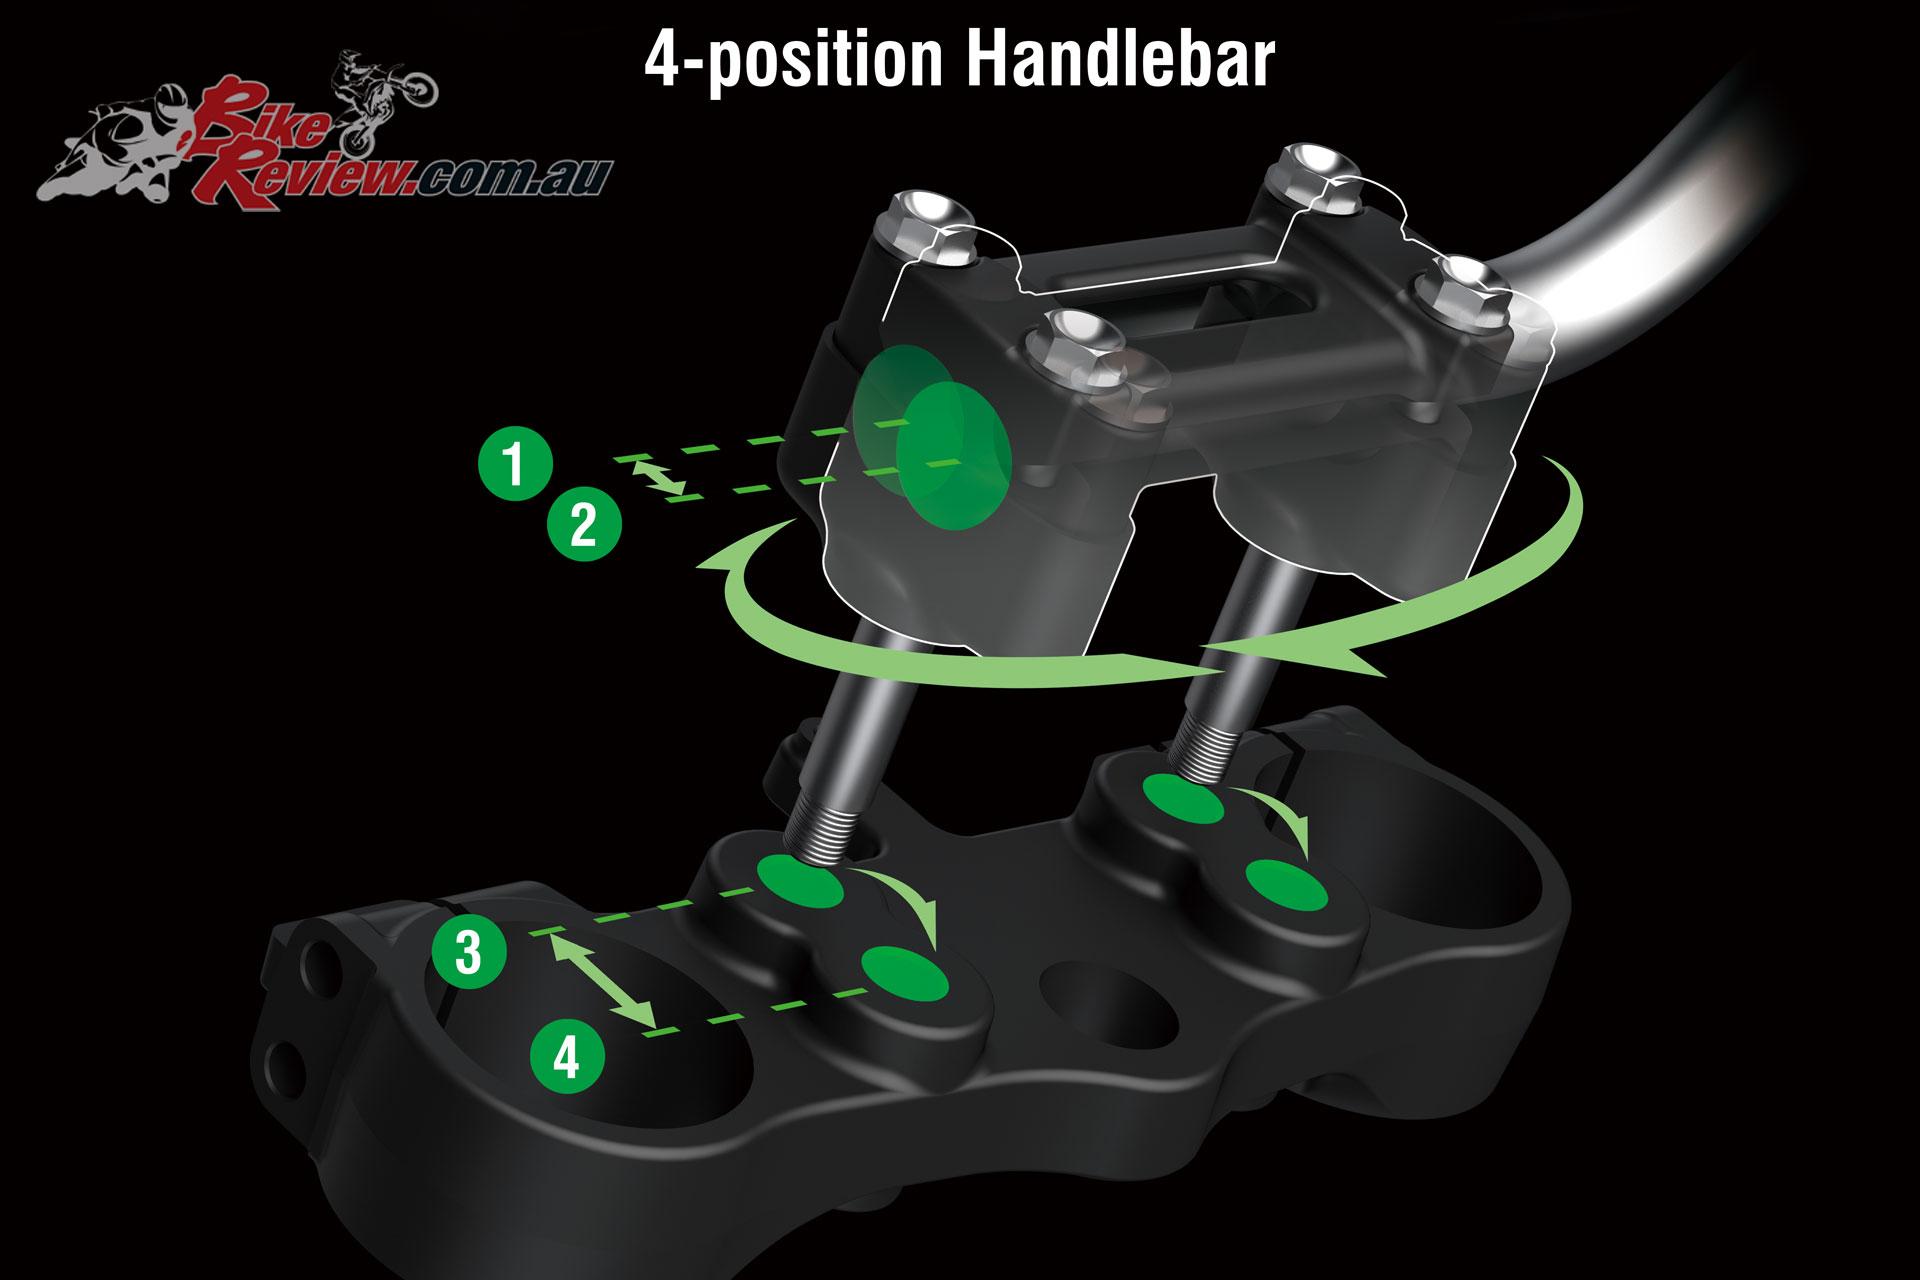 2020 Kawasaki KLX300R - Adjustable handlebars